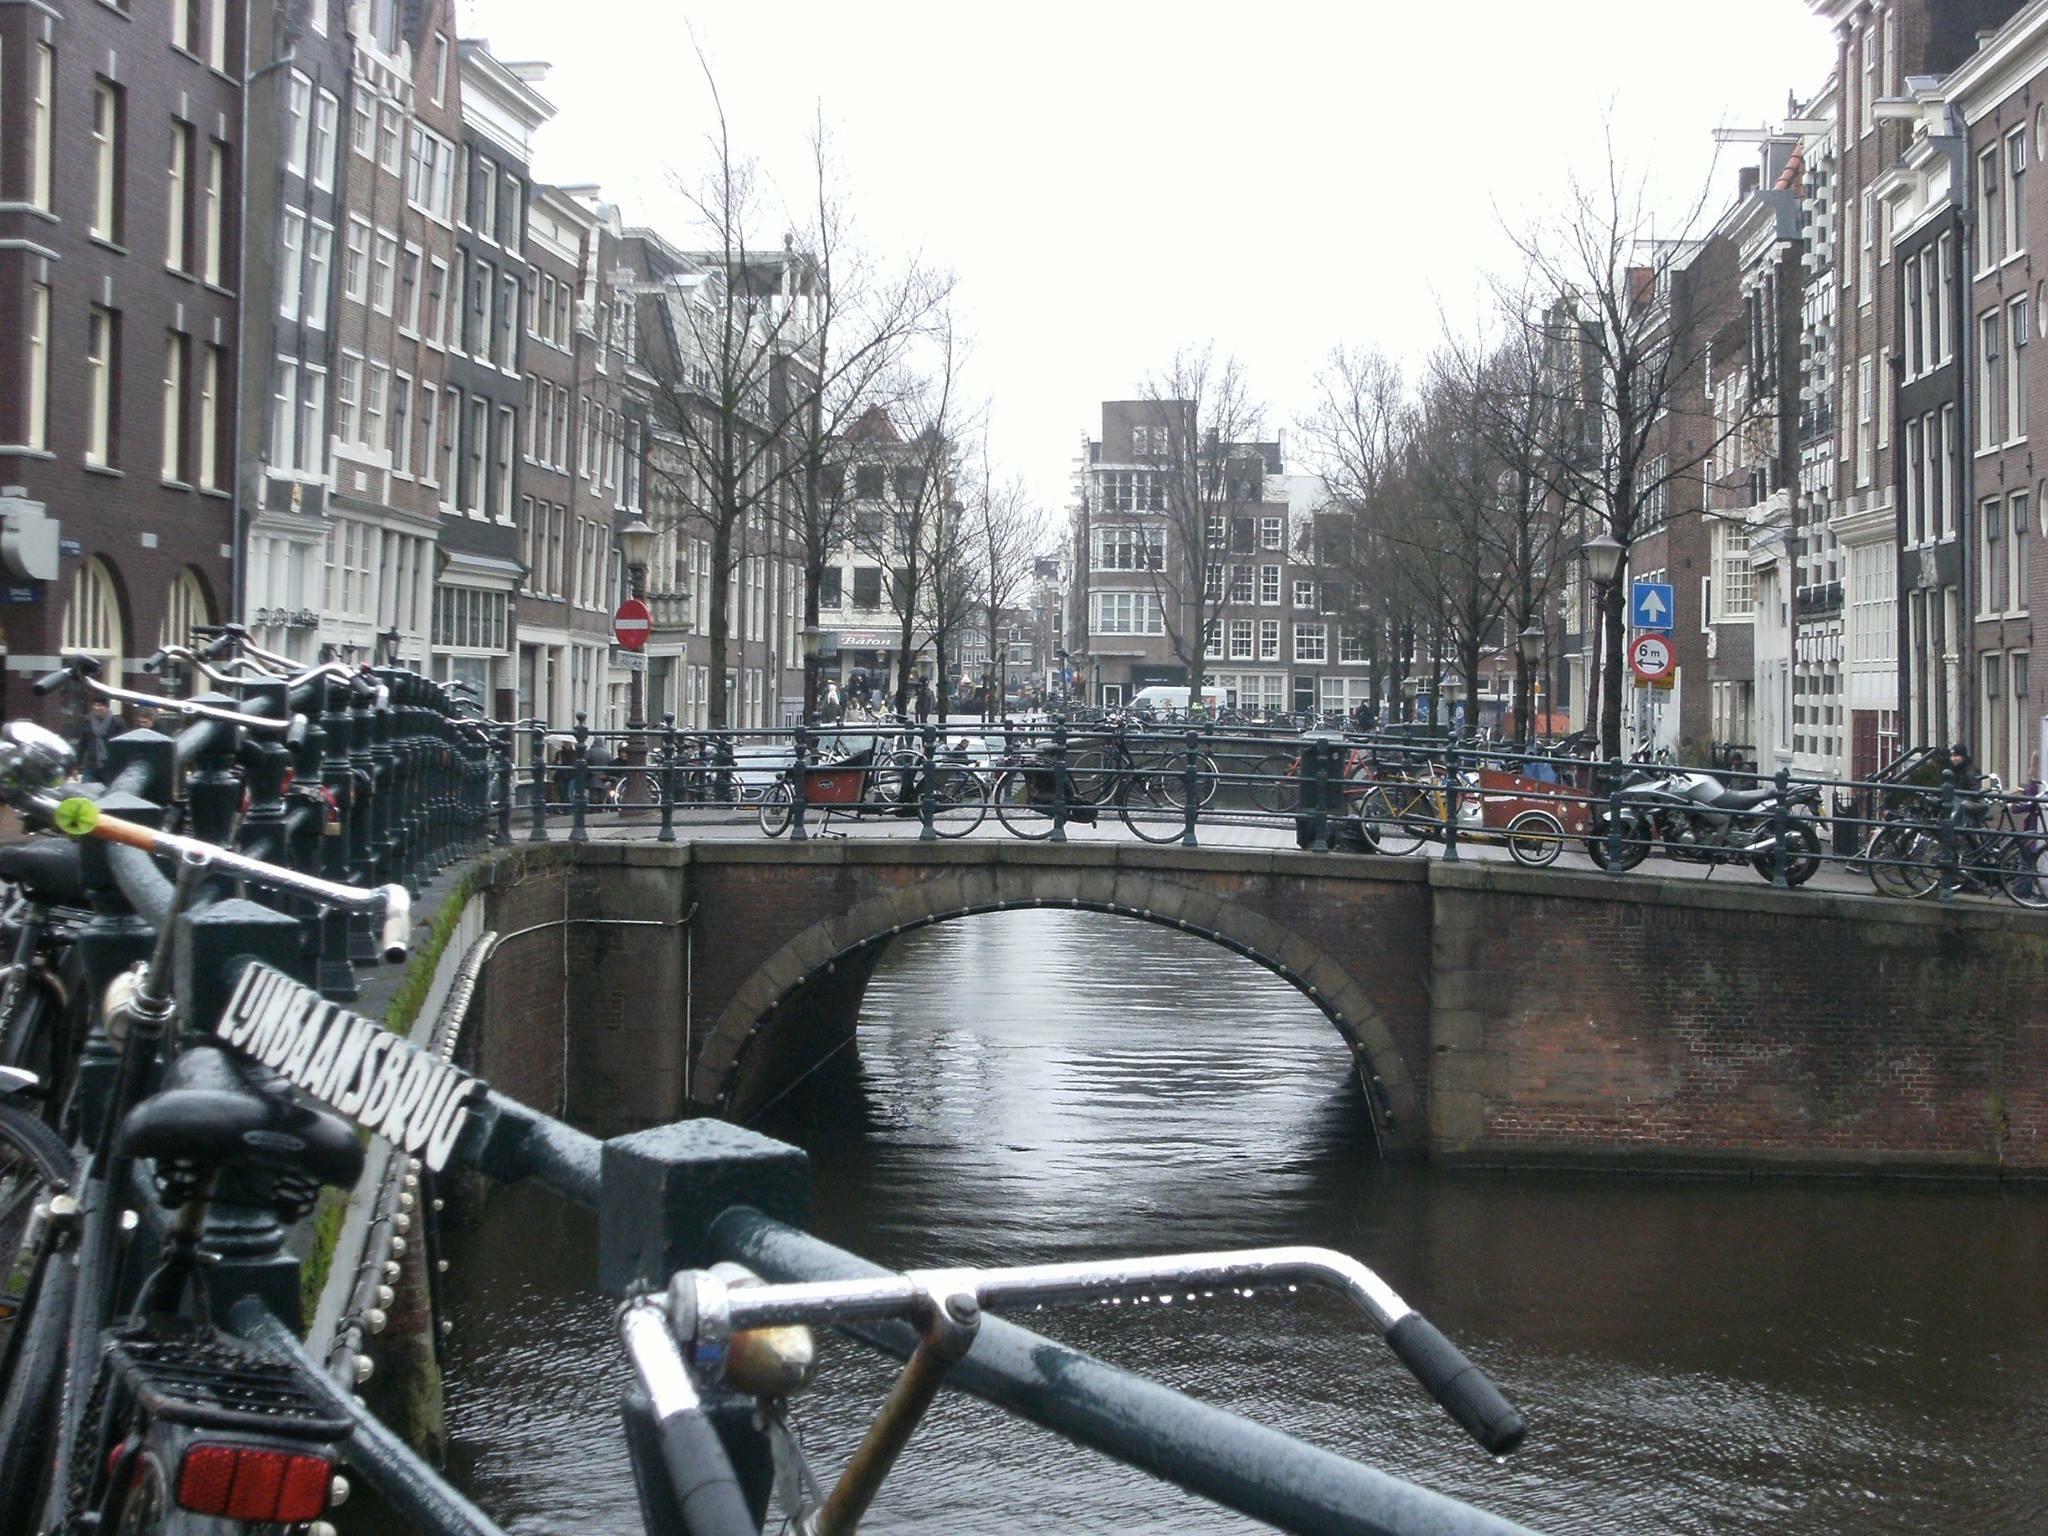 Seventeenth-century canal ring area of Amsterdam inside the Singelgracht - Netherlands